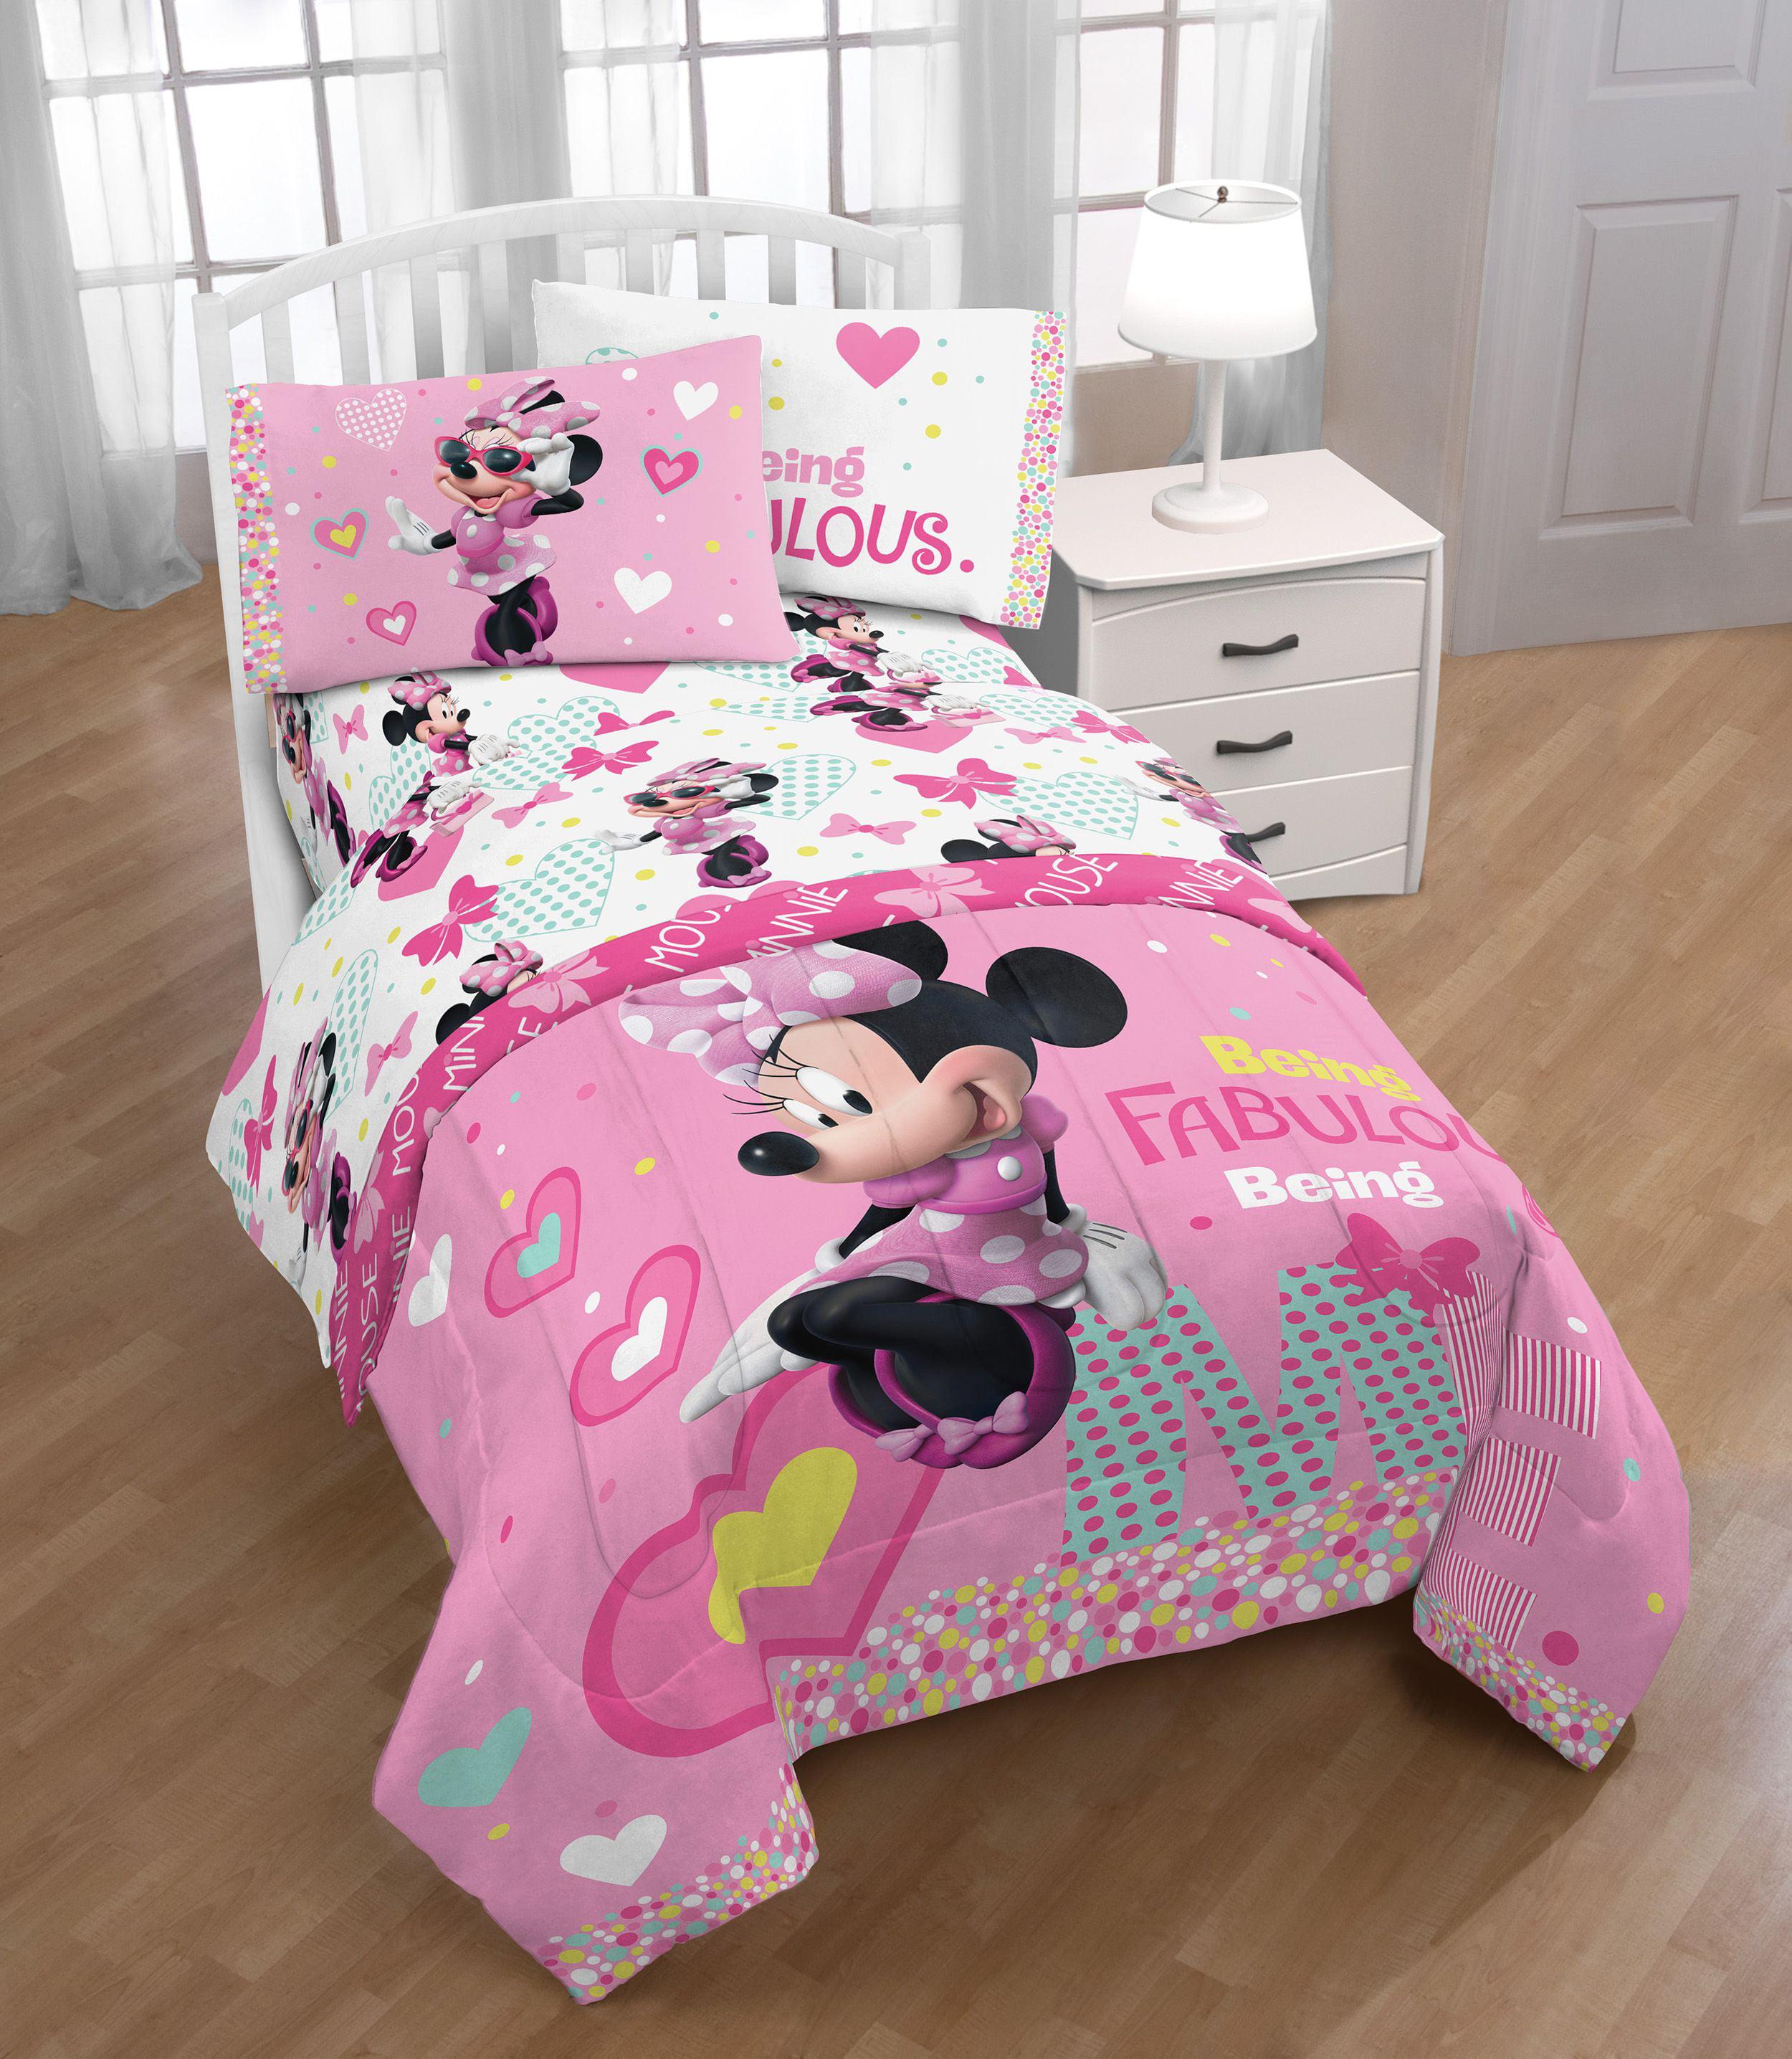 Disney Minnie Mouse Pink & White Kid's Bed Sheet Set - Walmart.com -  Walmart.com